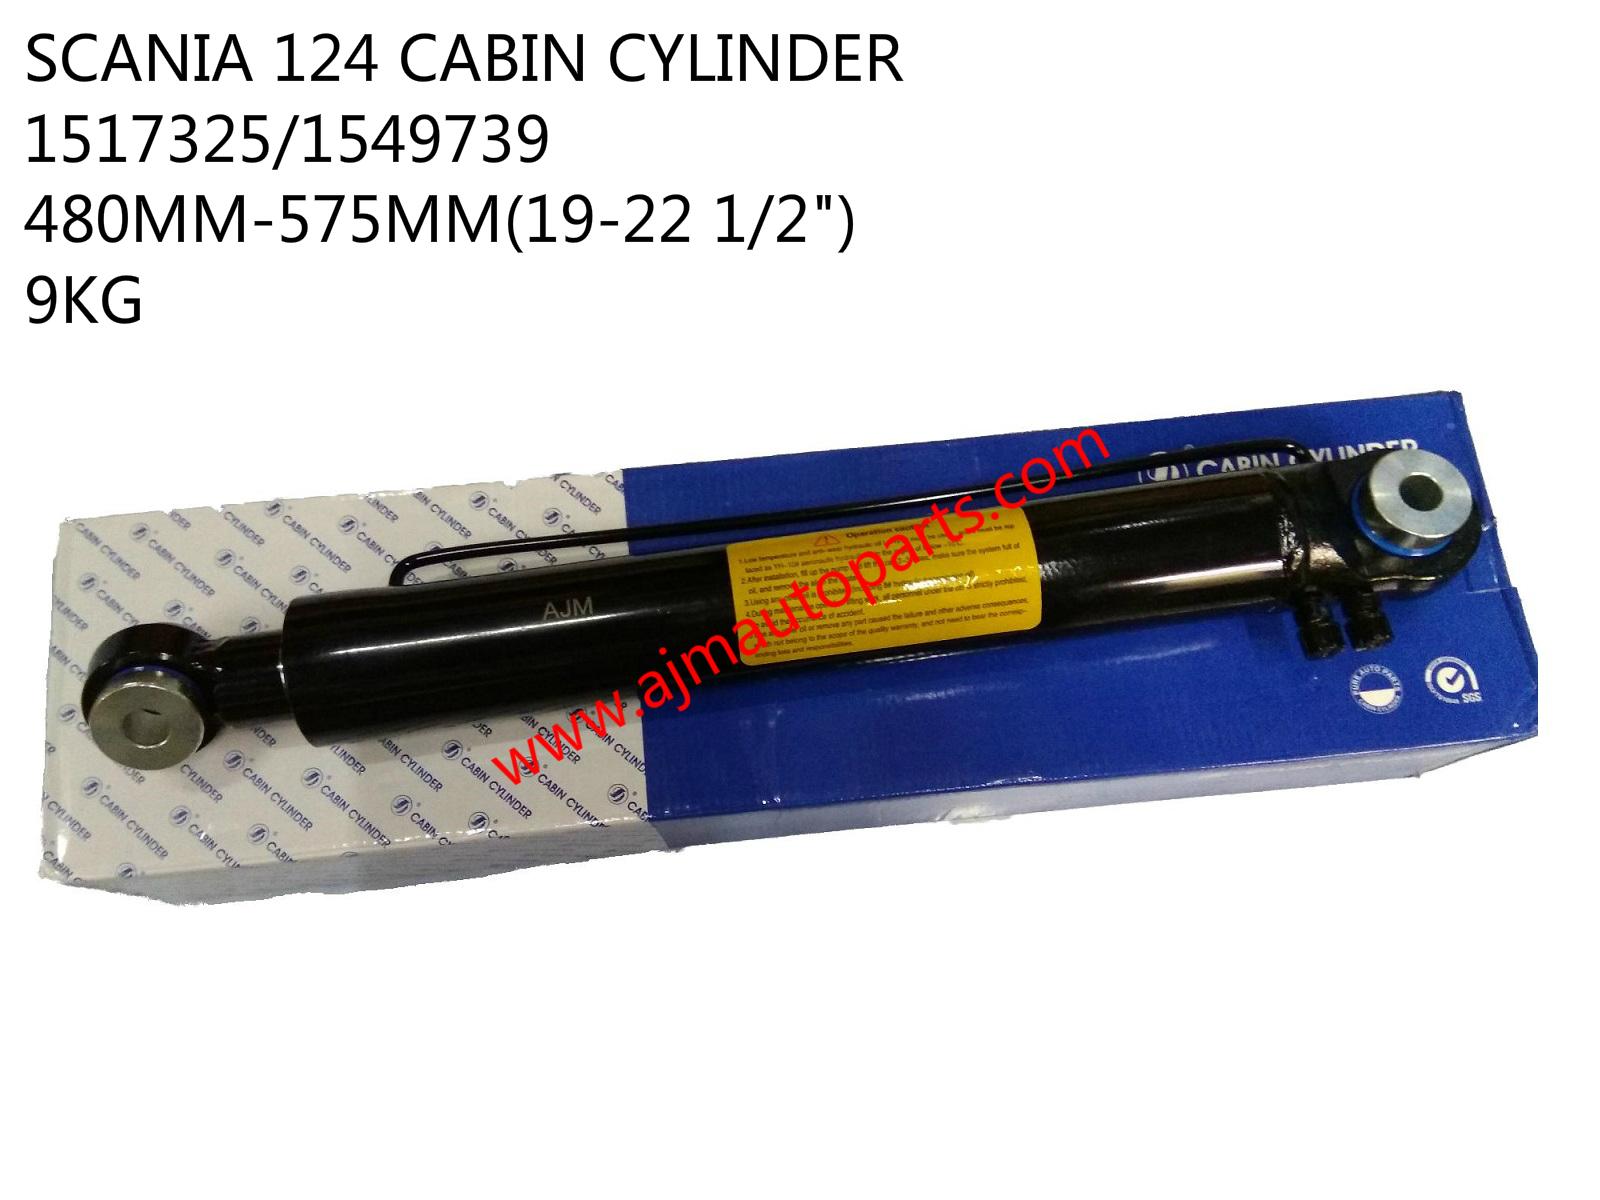 SCANIA_124_CABIN_CYLINDER-1517325-1549739